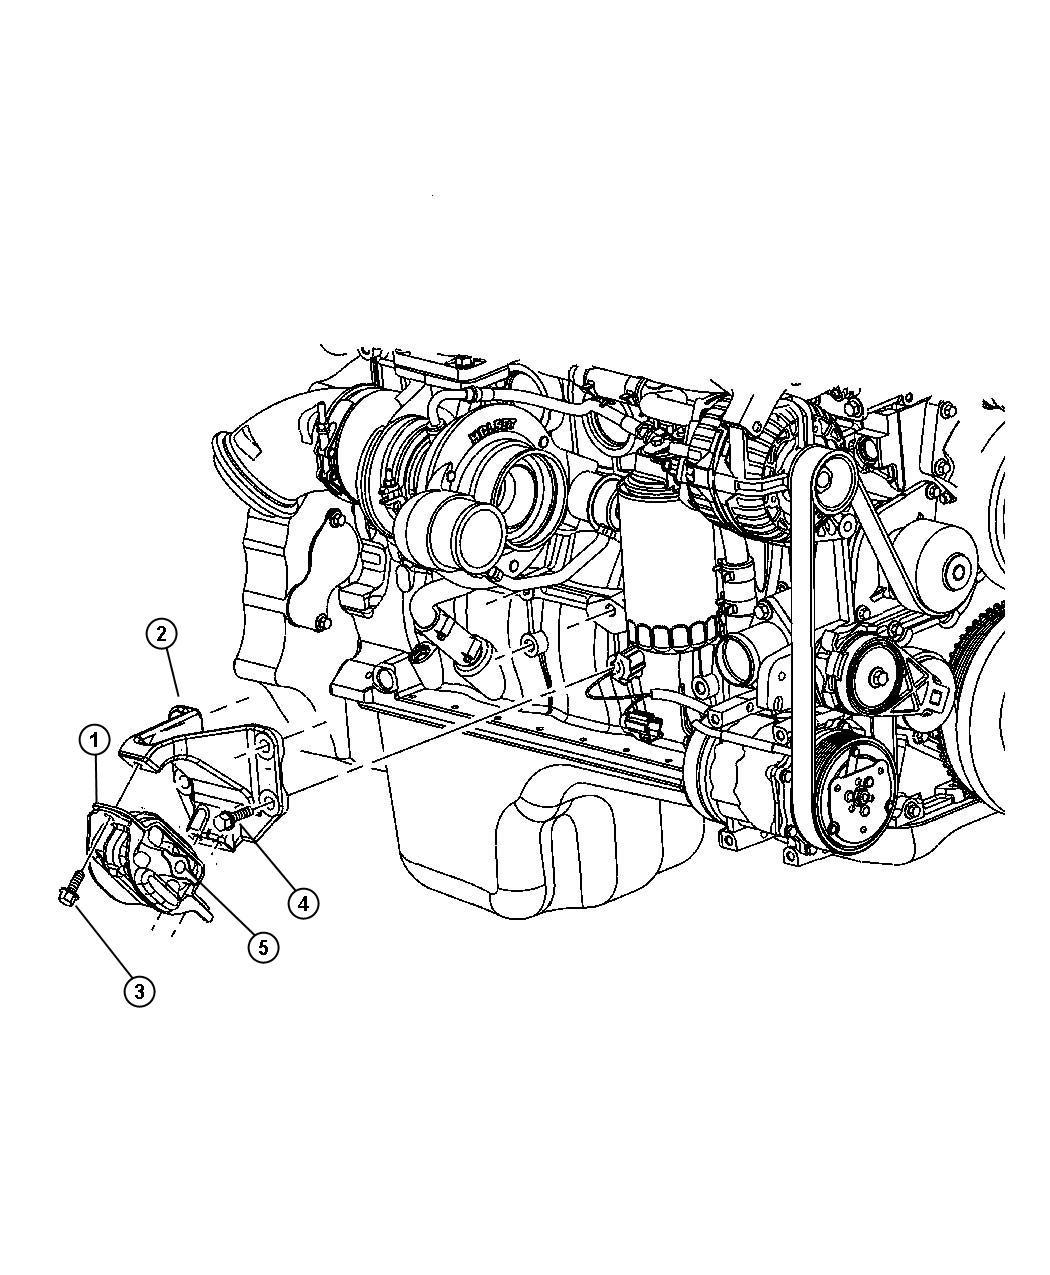 Dodge Ram Insulator Engine Mount Used For